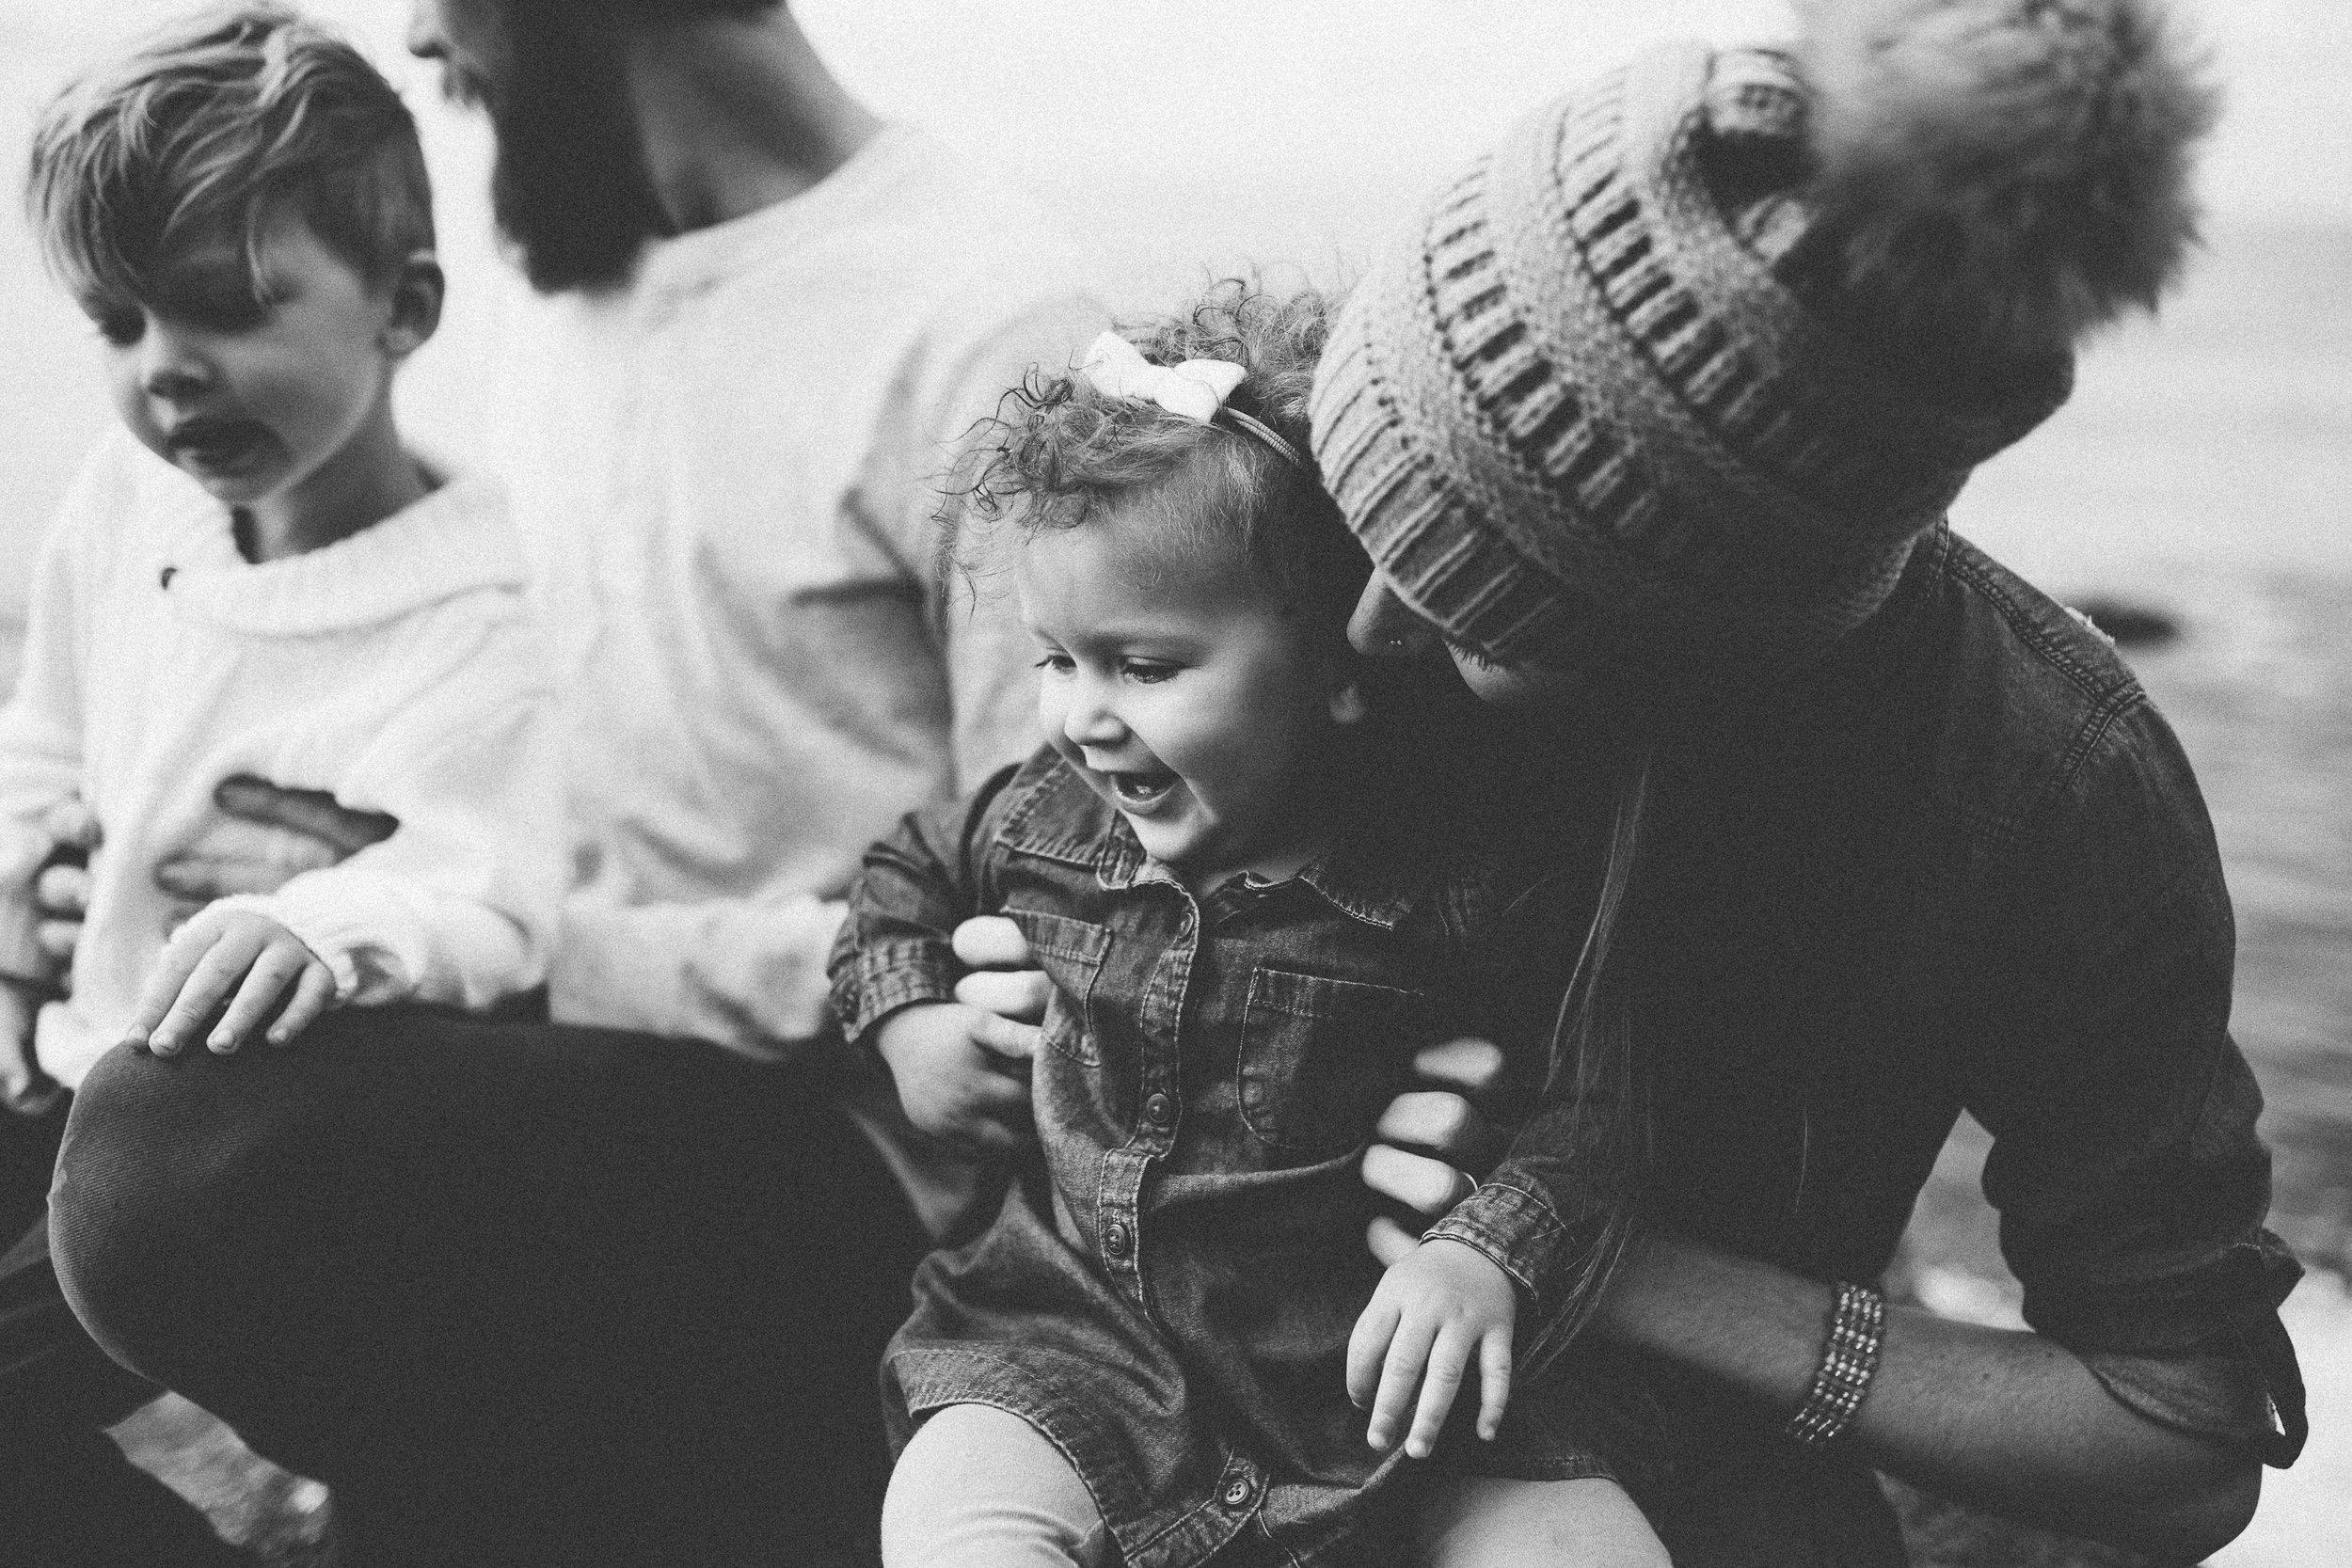 Family-Photographer-Bellingham-WA-Brianne-Bell-Photography-(Miller)114.jpg